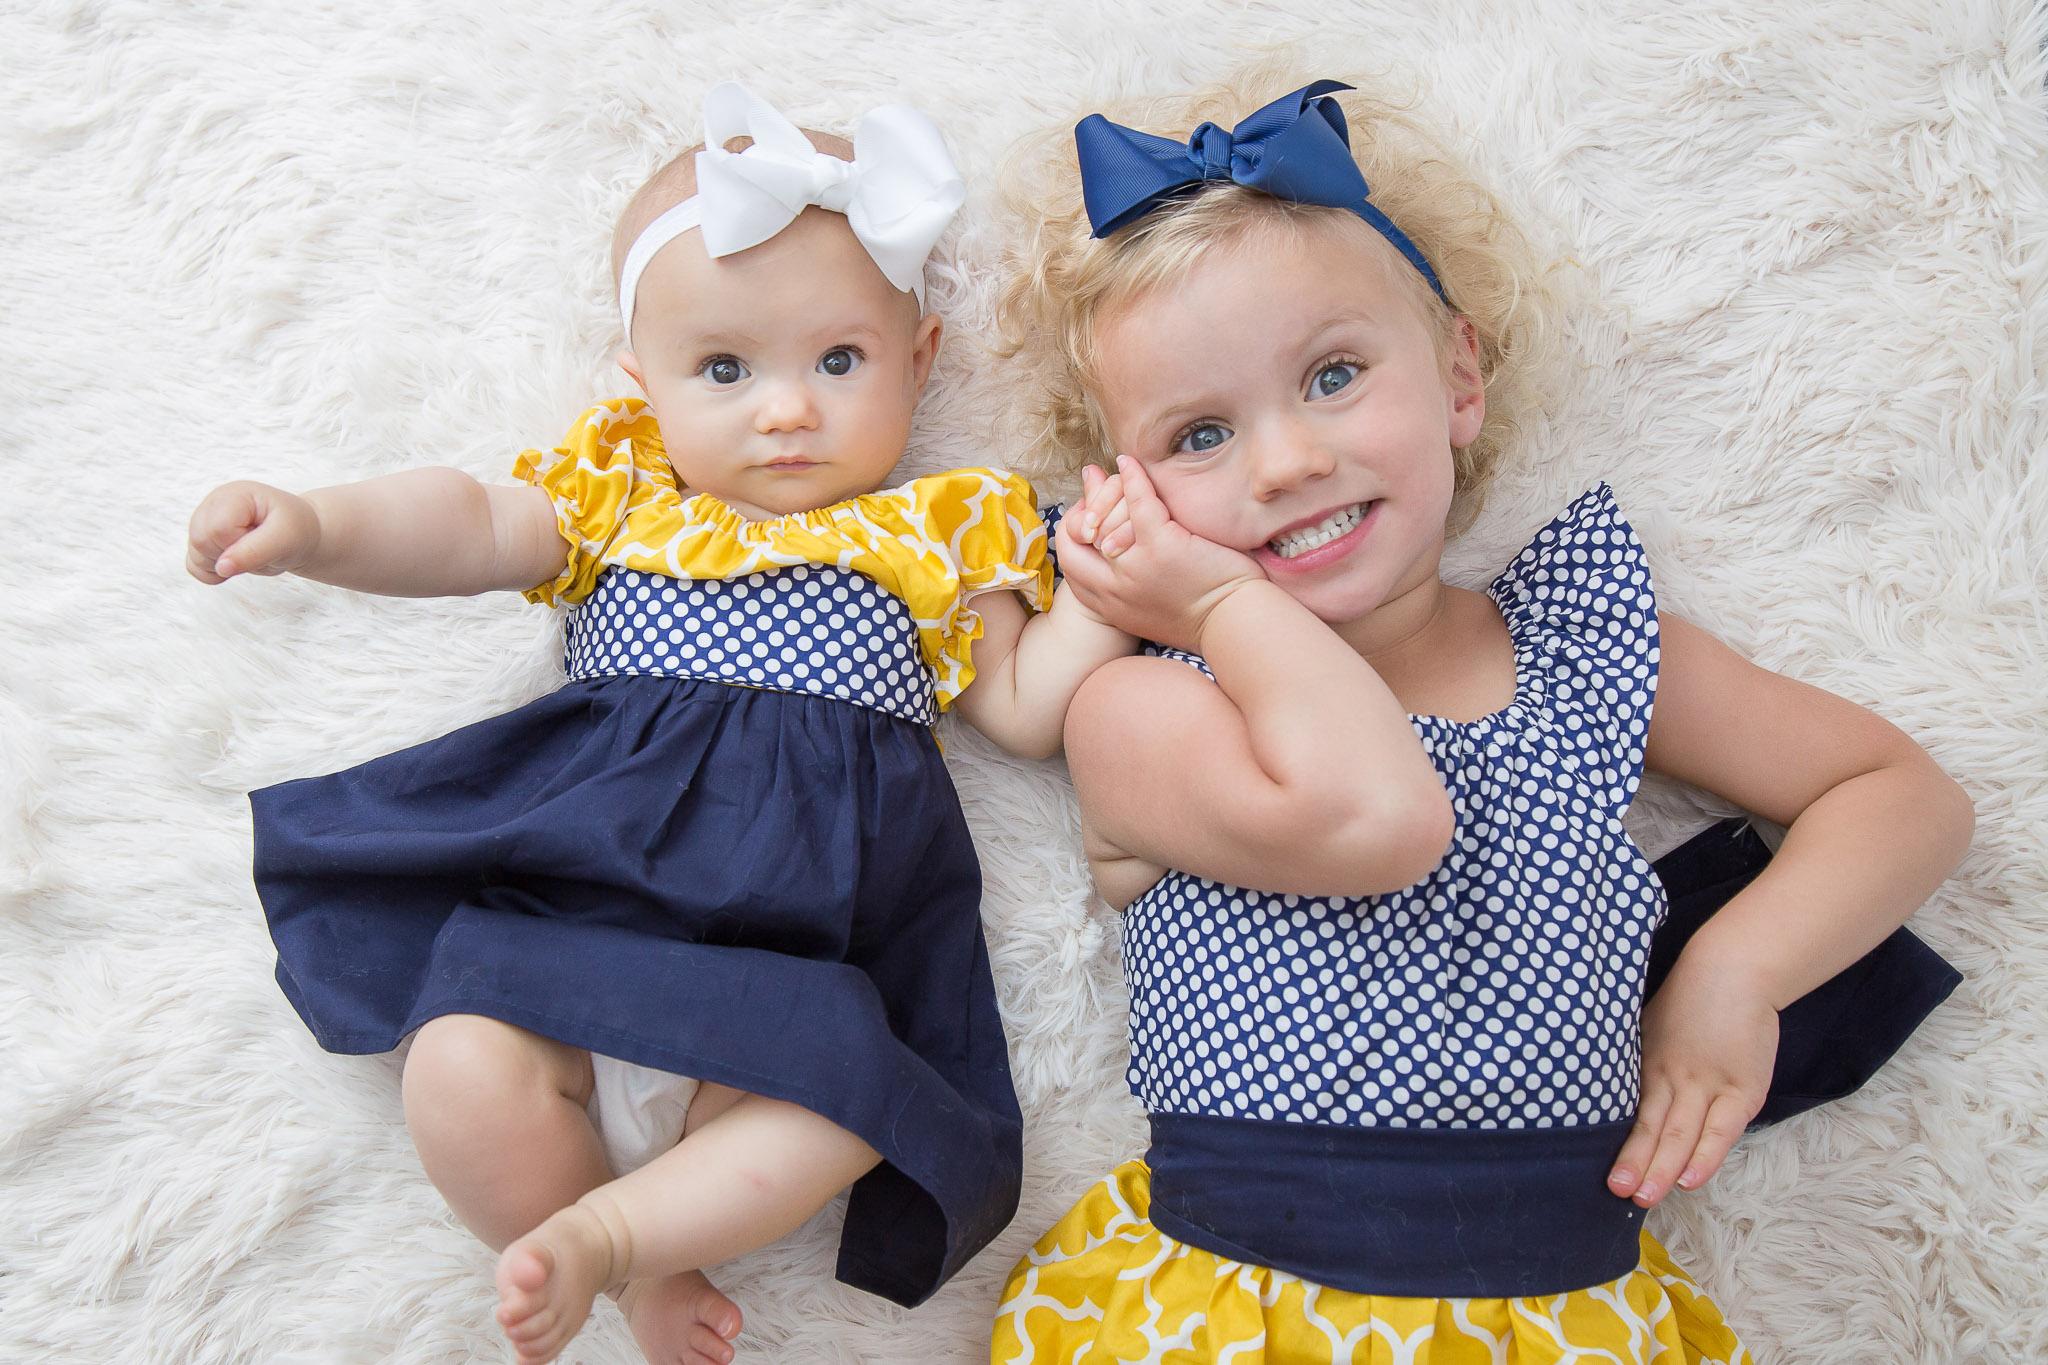 toddler-baby-sister-photo-navy-yellow.jpg